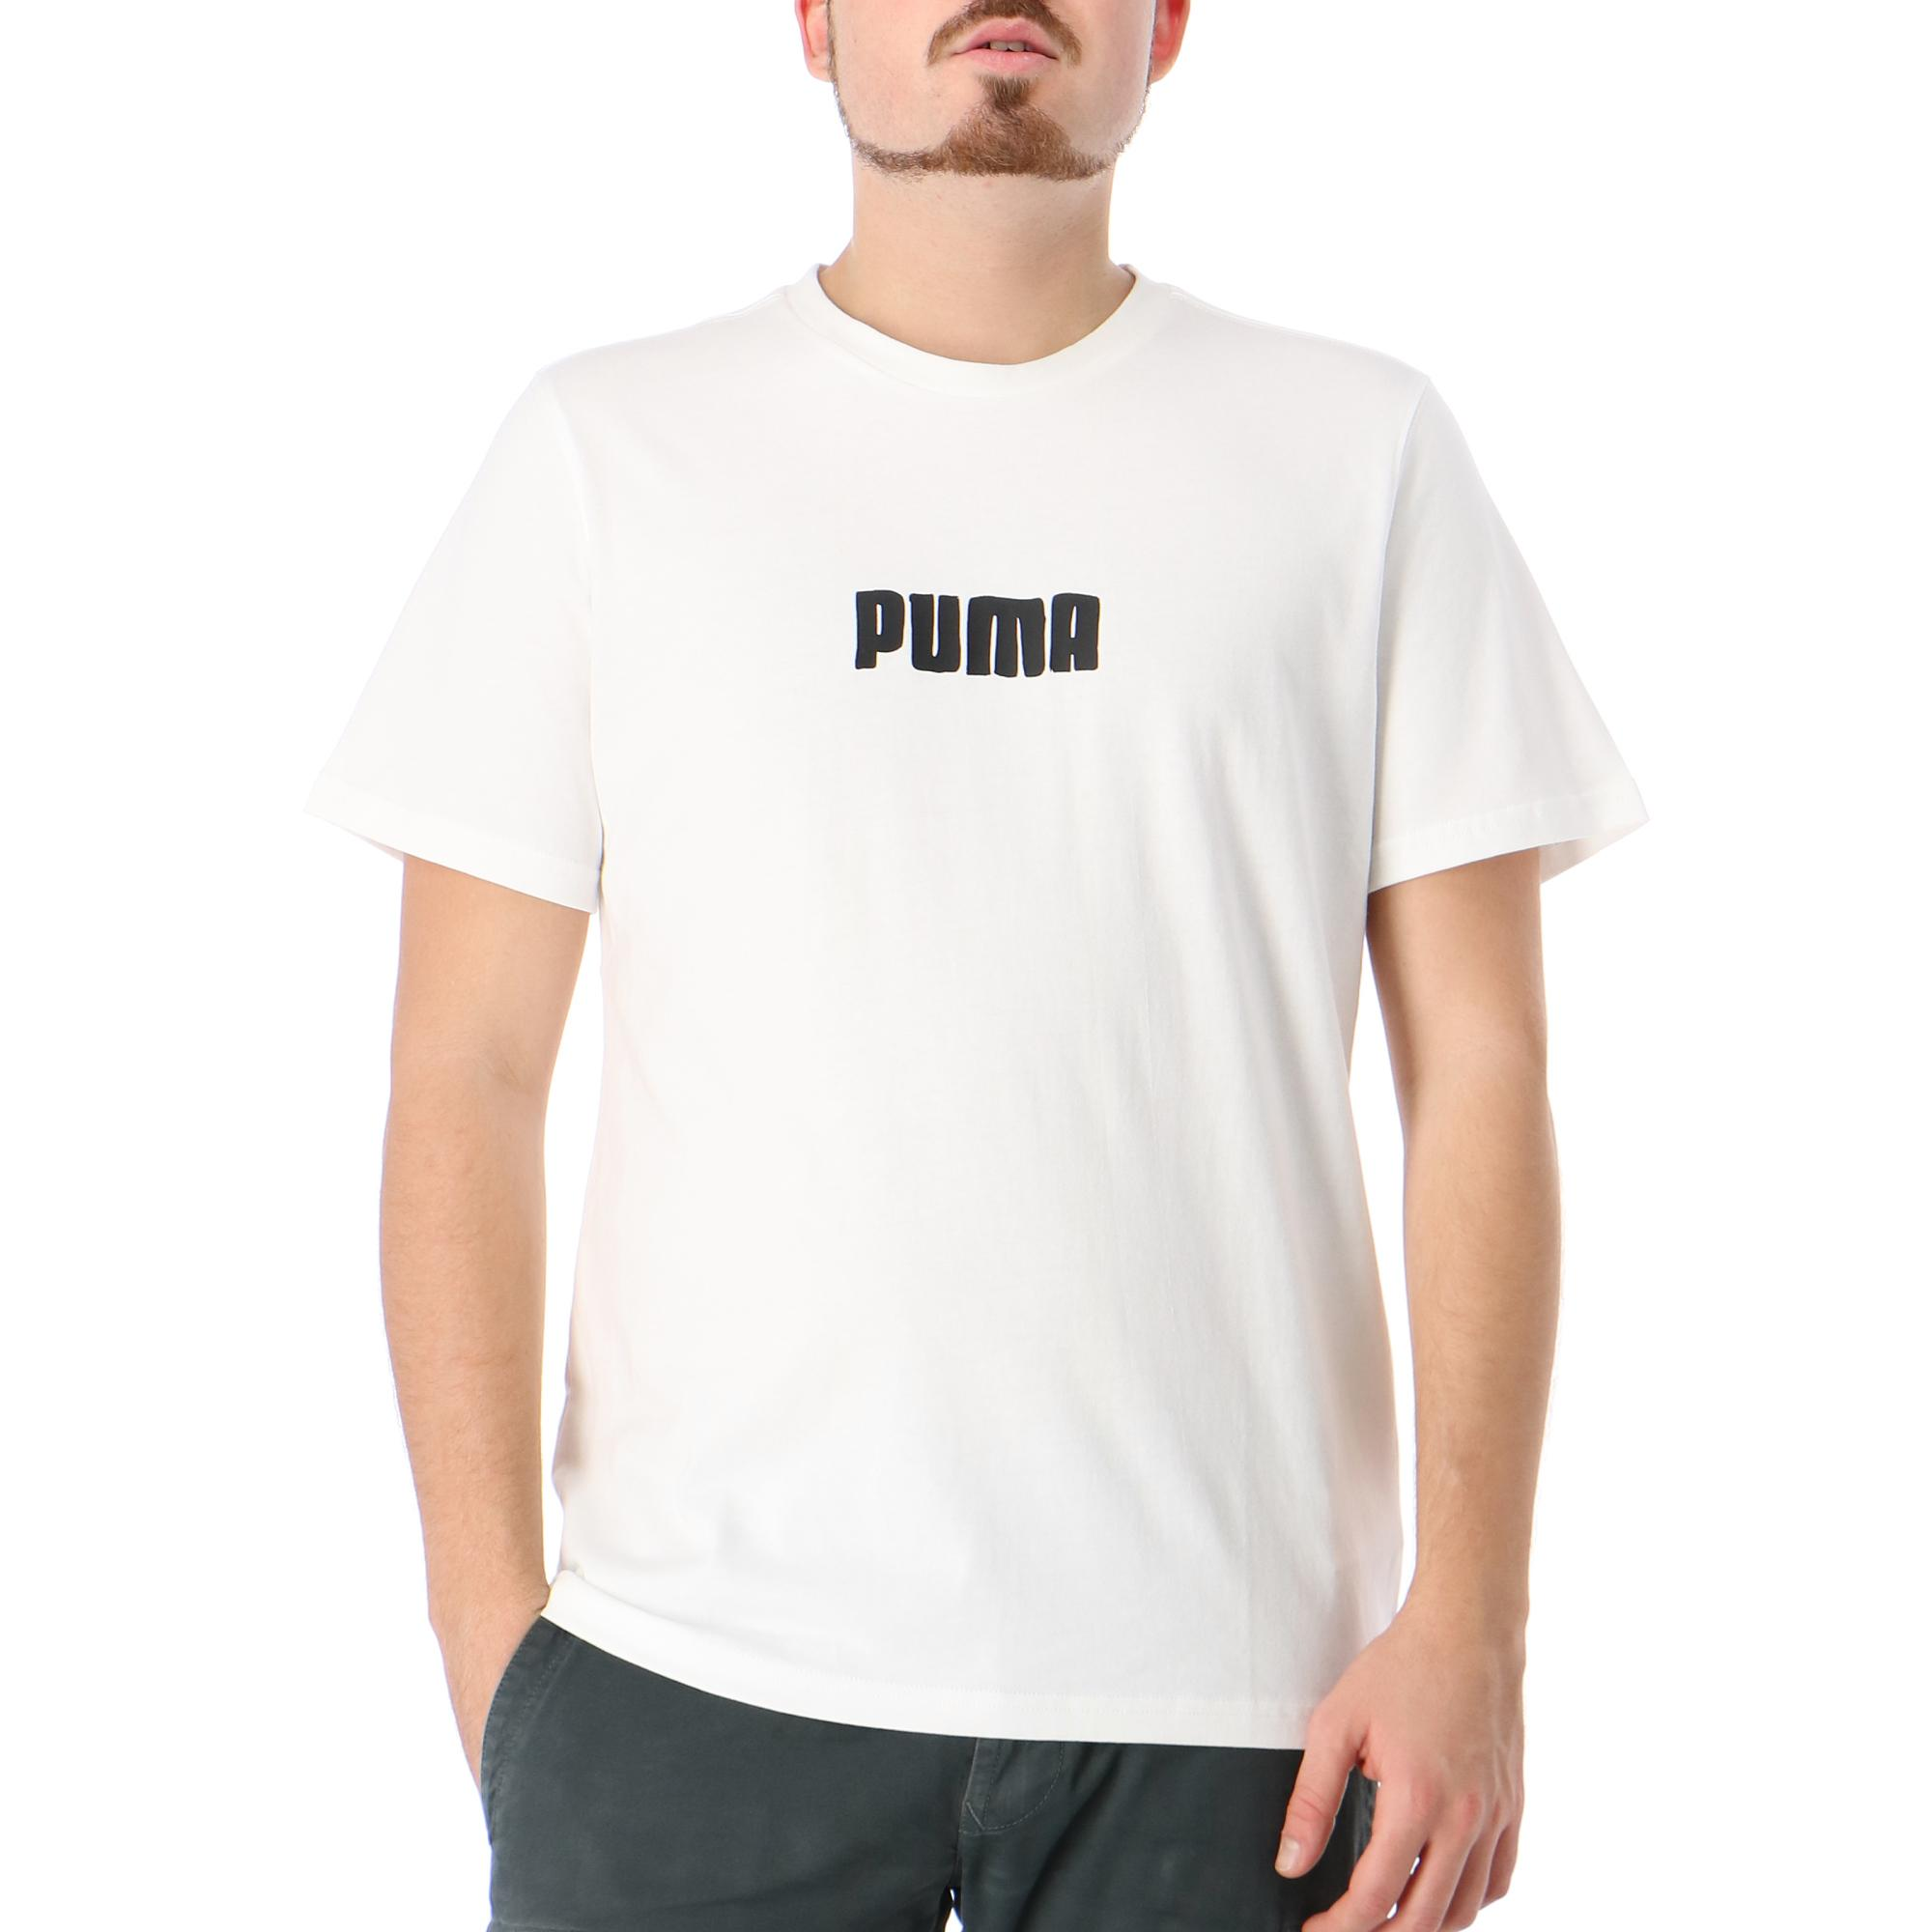 Puma Cat Jaws Tee Puma white